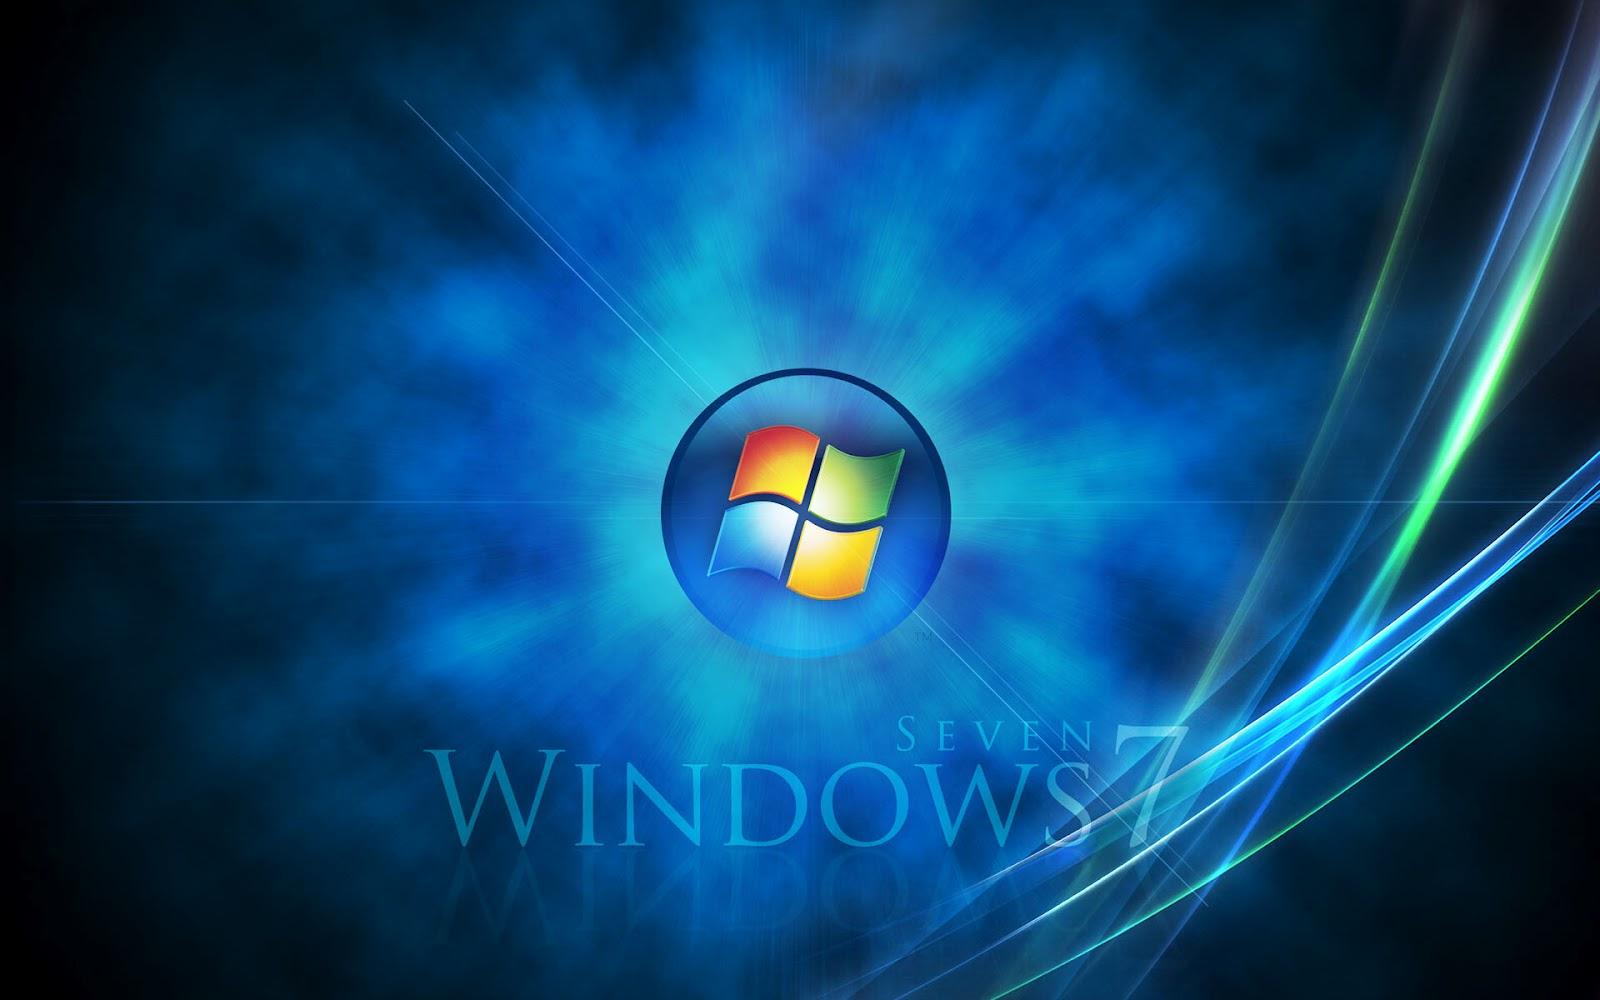 wallpapersblogspotcom201210windows 7 original wallpapers windows 1600x1000